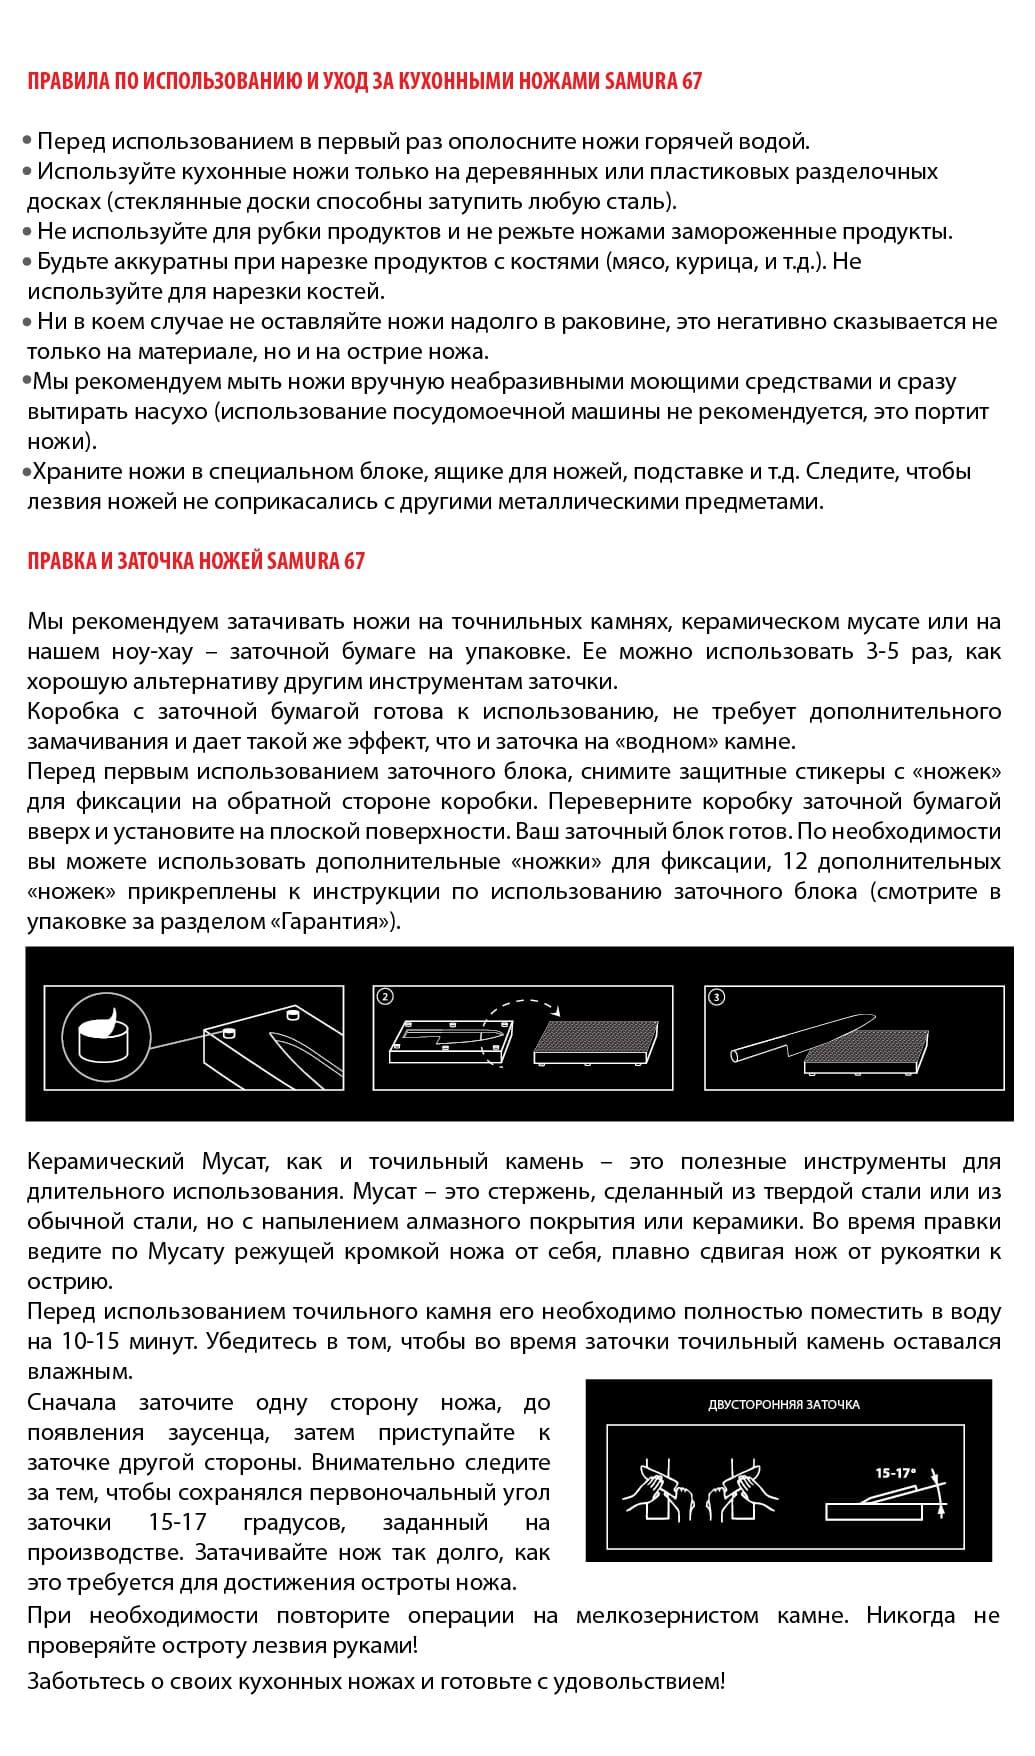 instruction_A4_67-min.jpg